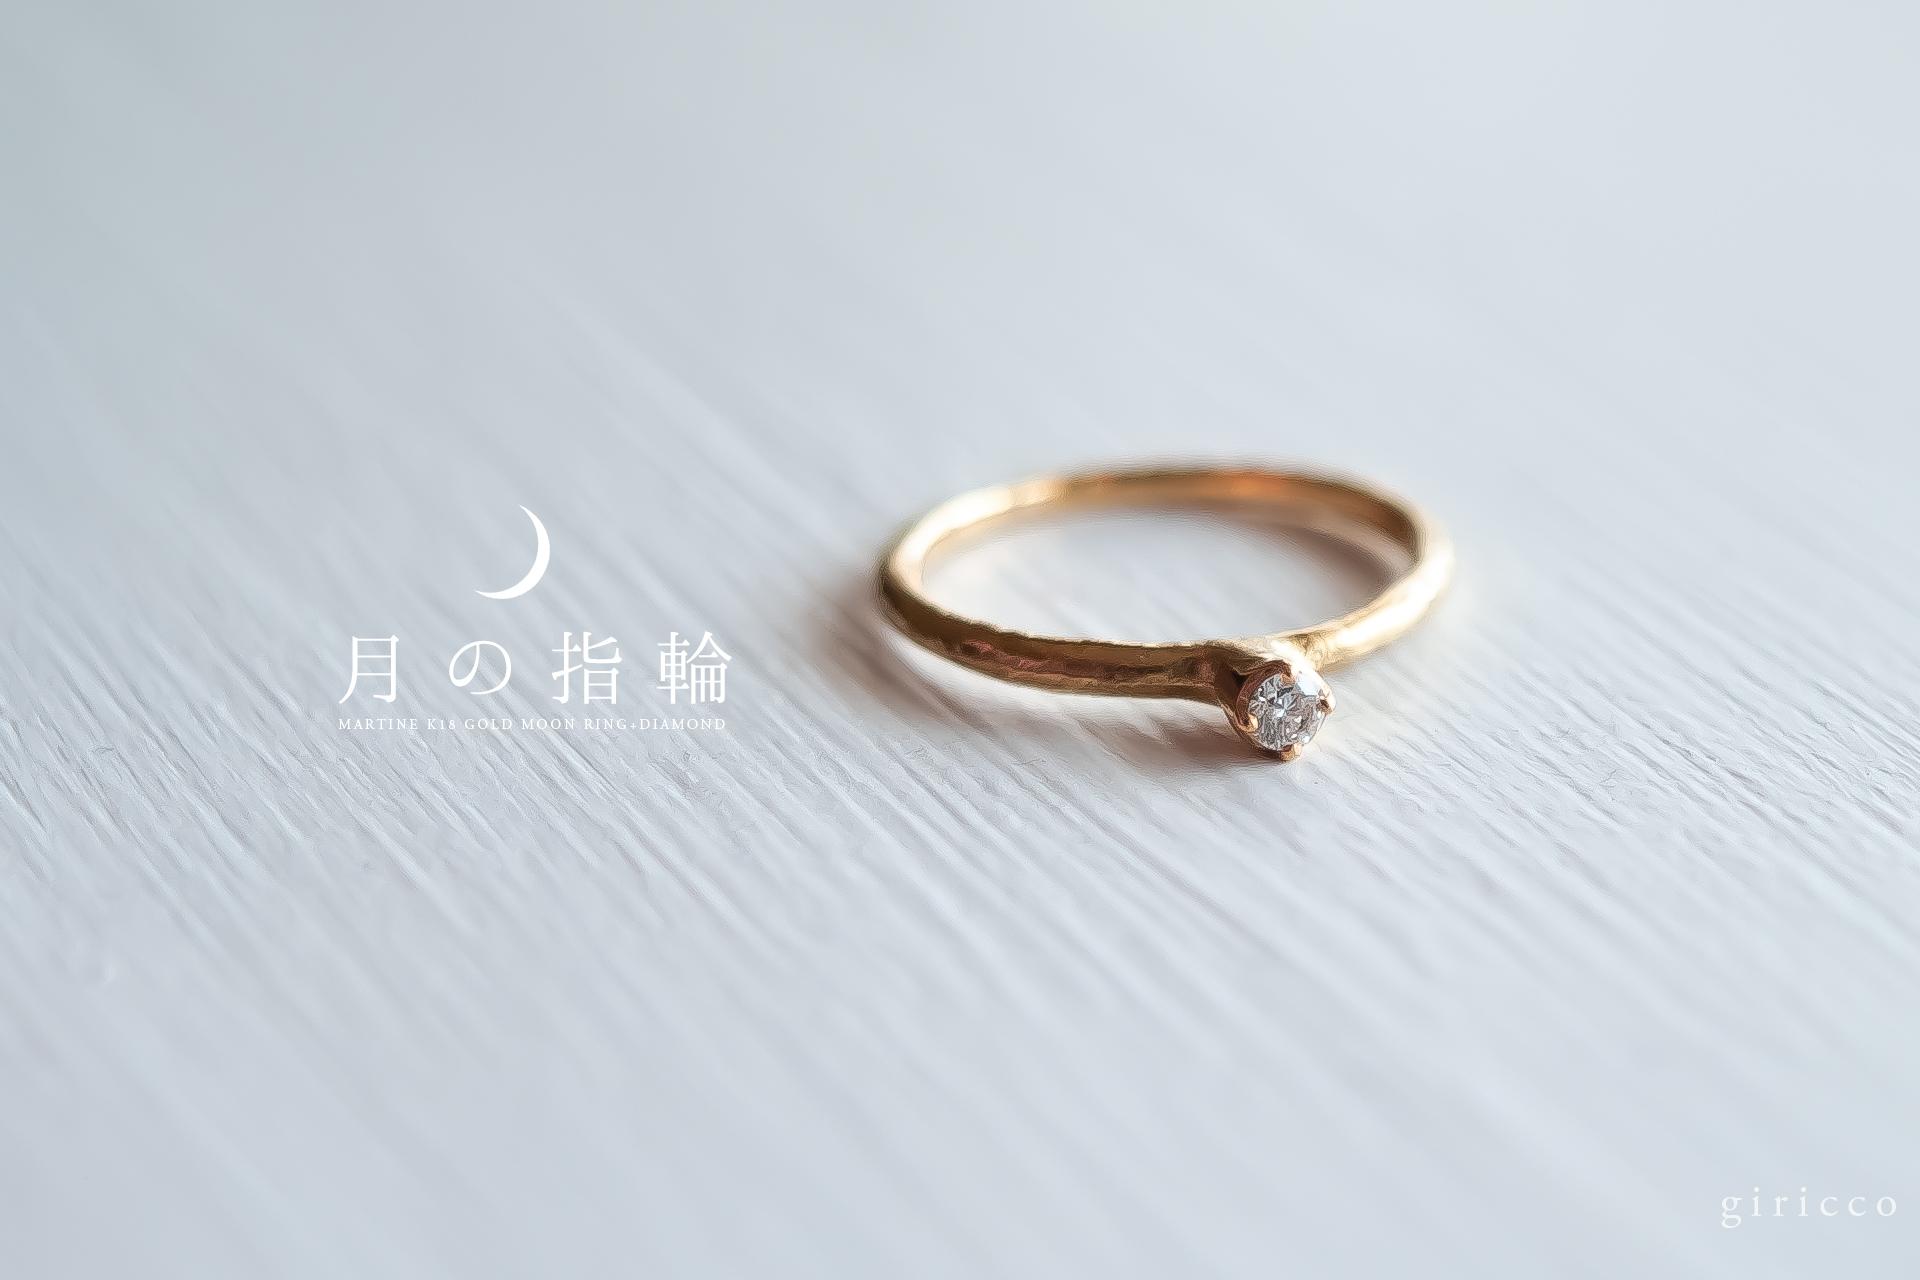 MARTINE K18 ゴールドリング 月の指輪+ダイヤモンド